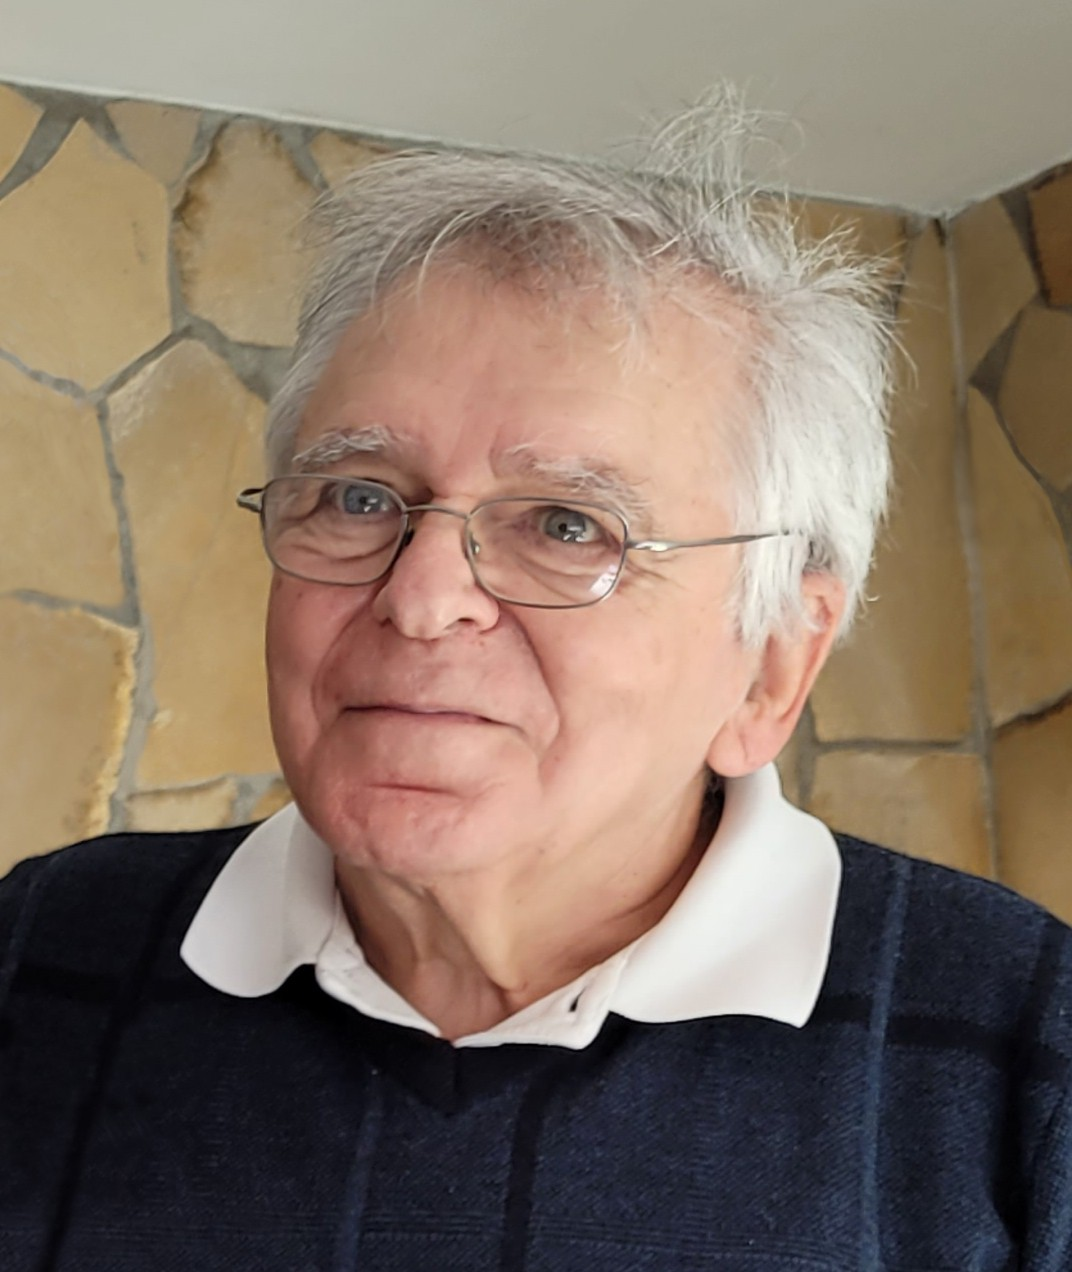 Jean-Claude Lagache